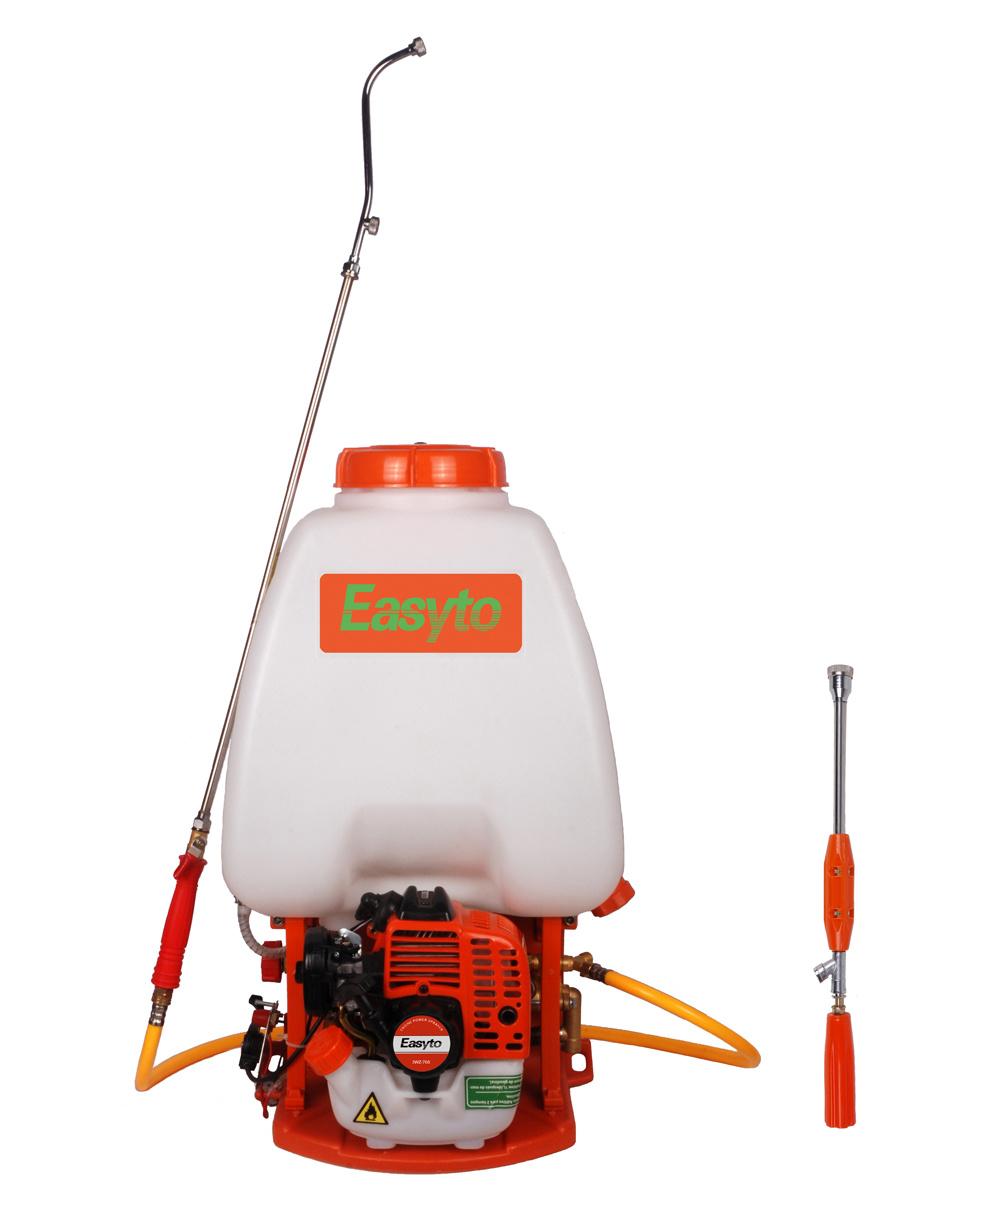 Knapsack Power Sprayer for Agricultural (3WZ-768)